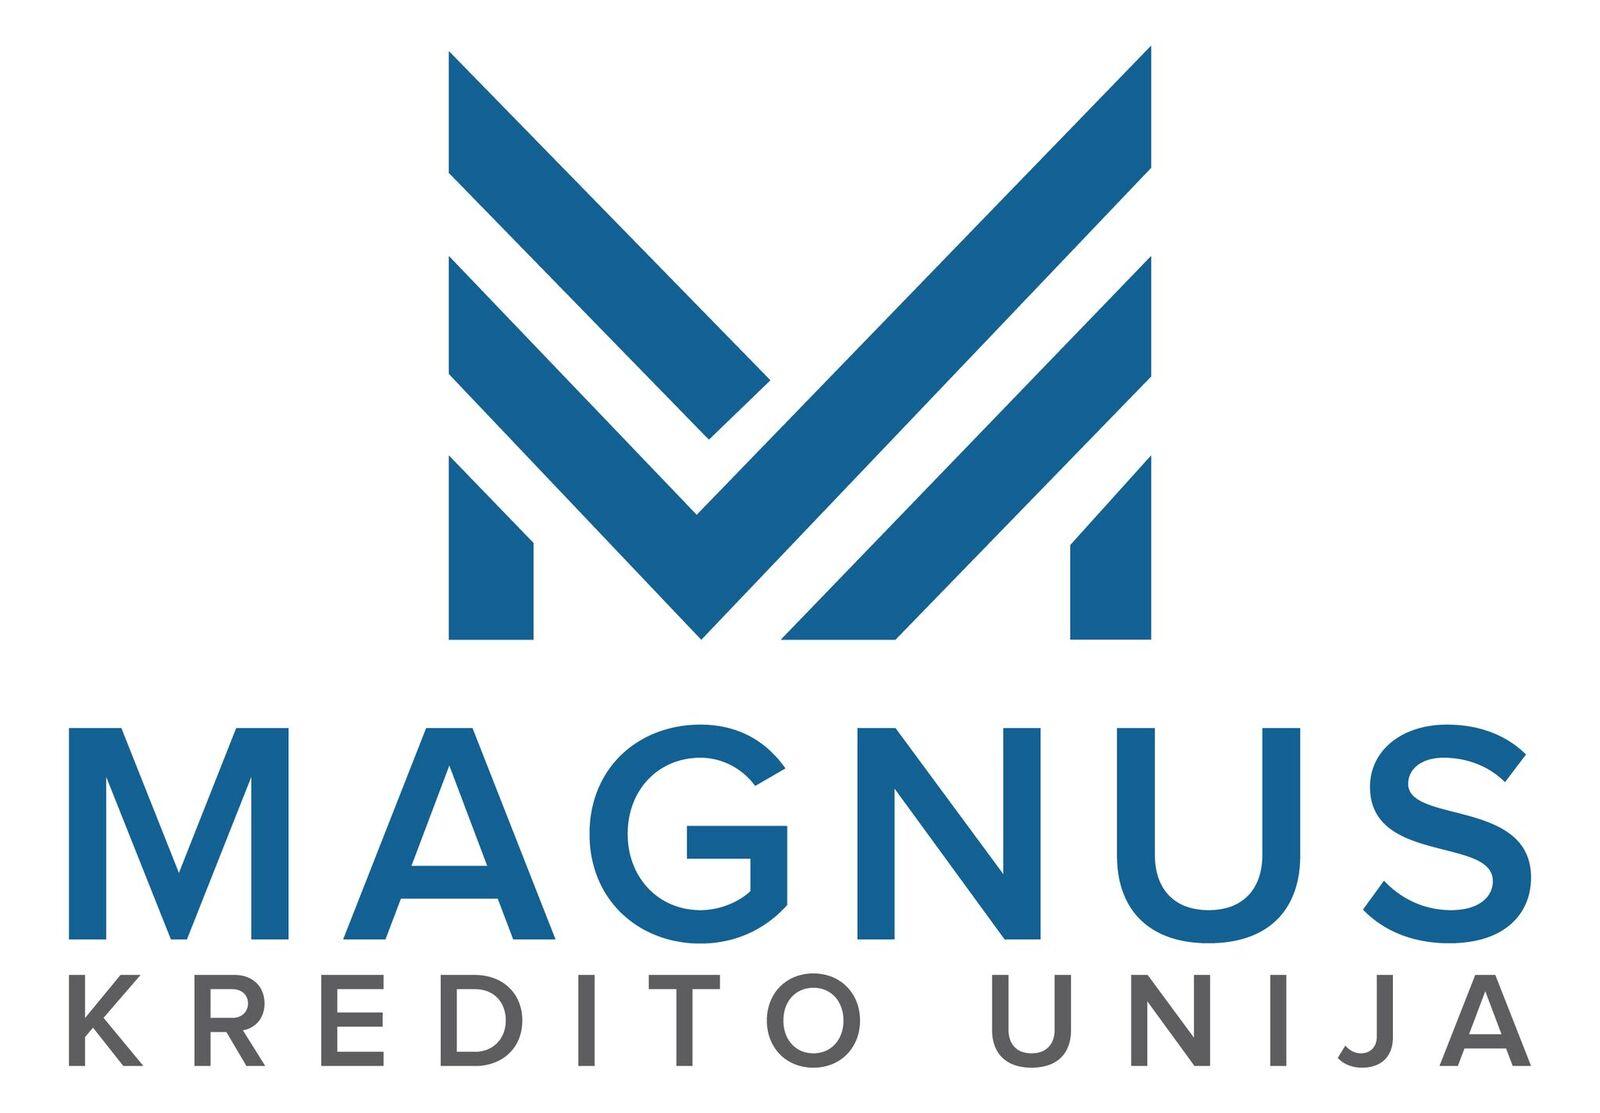 MAGNUS kredito unija paskolos